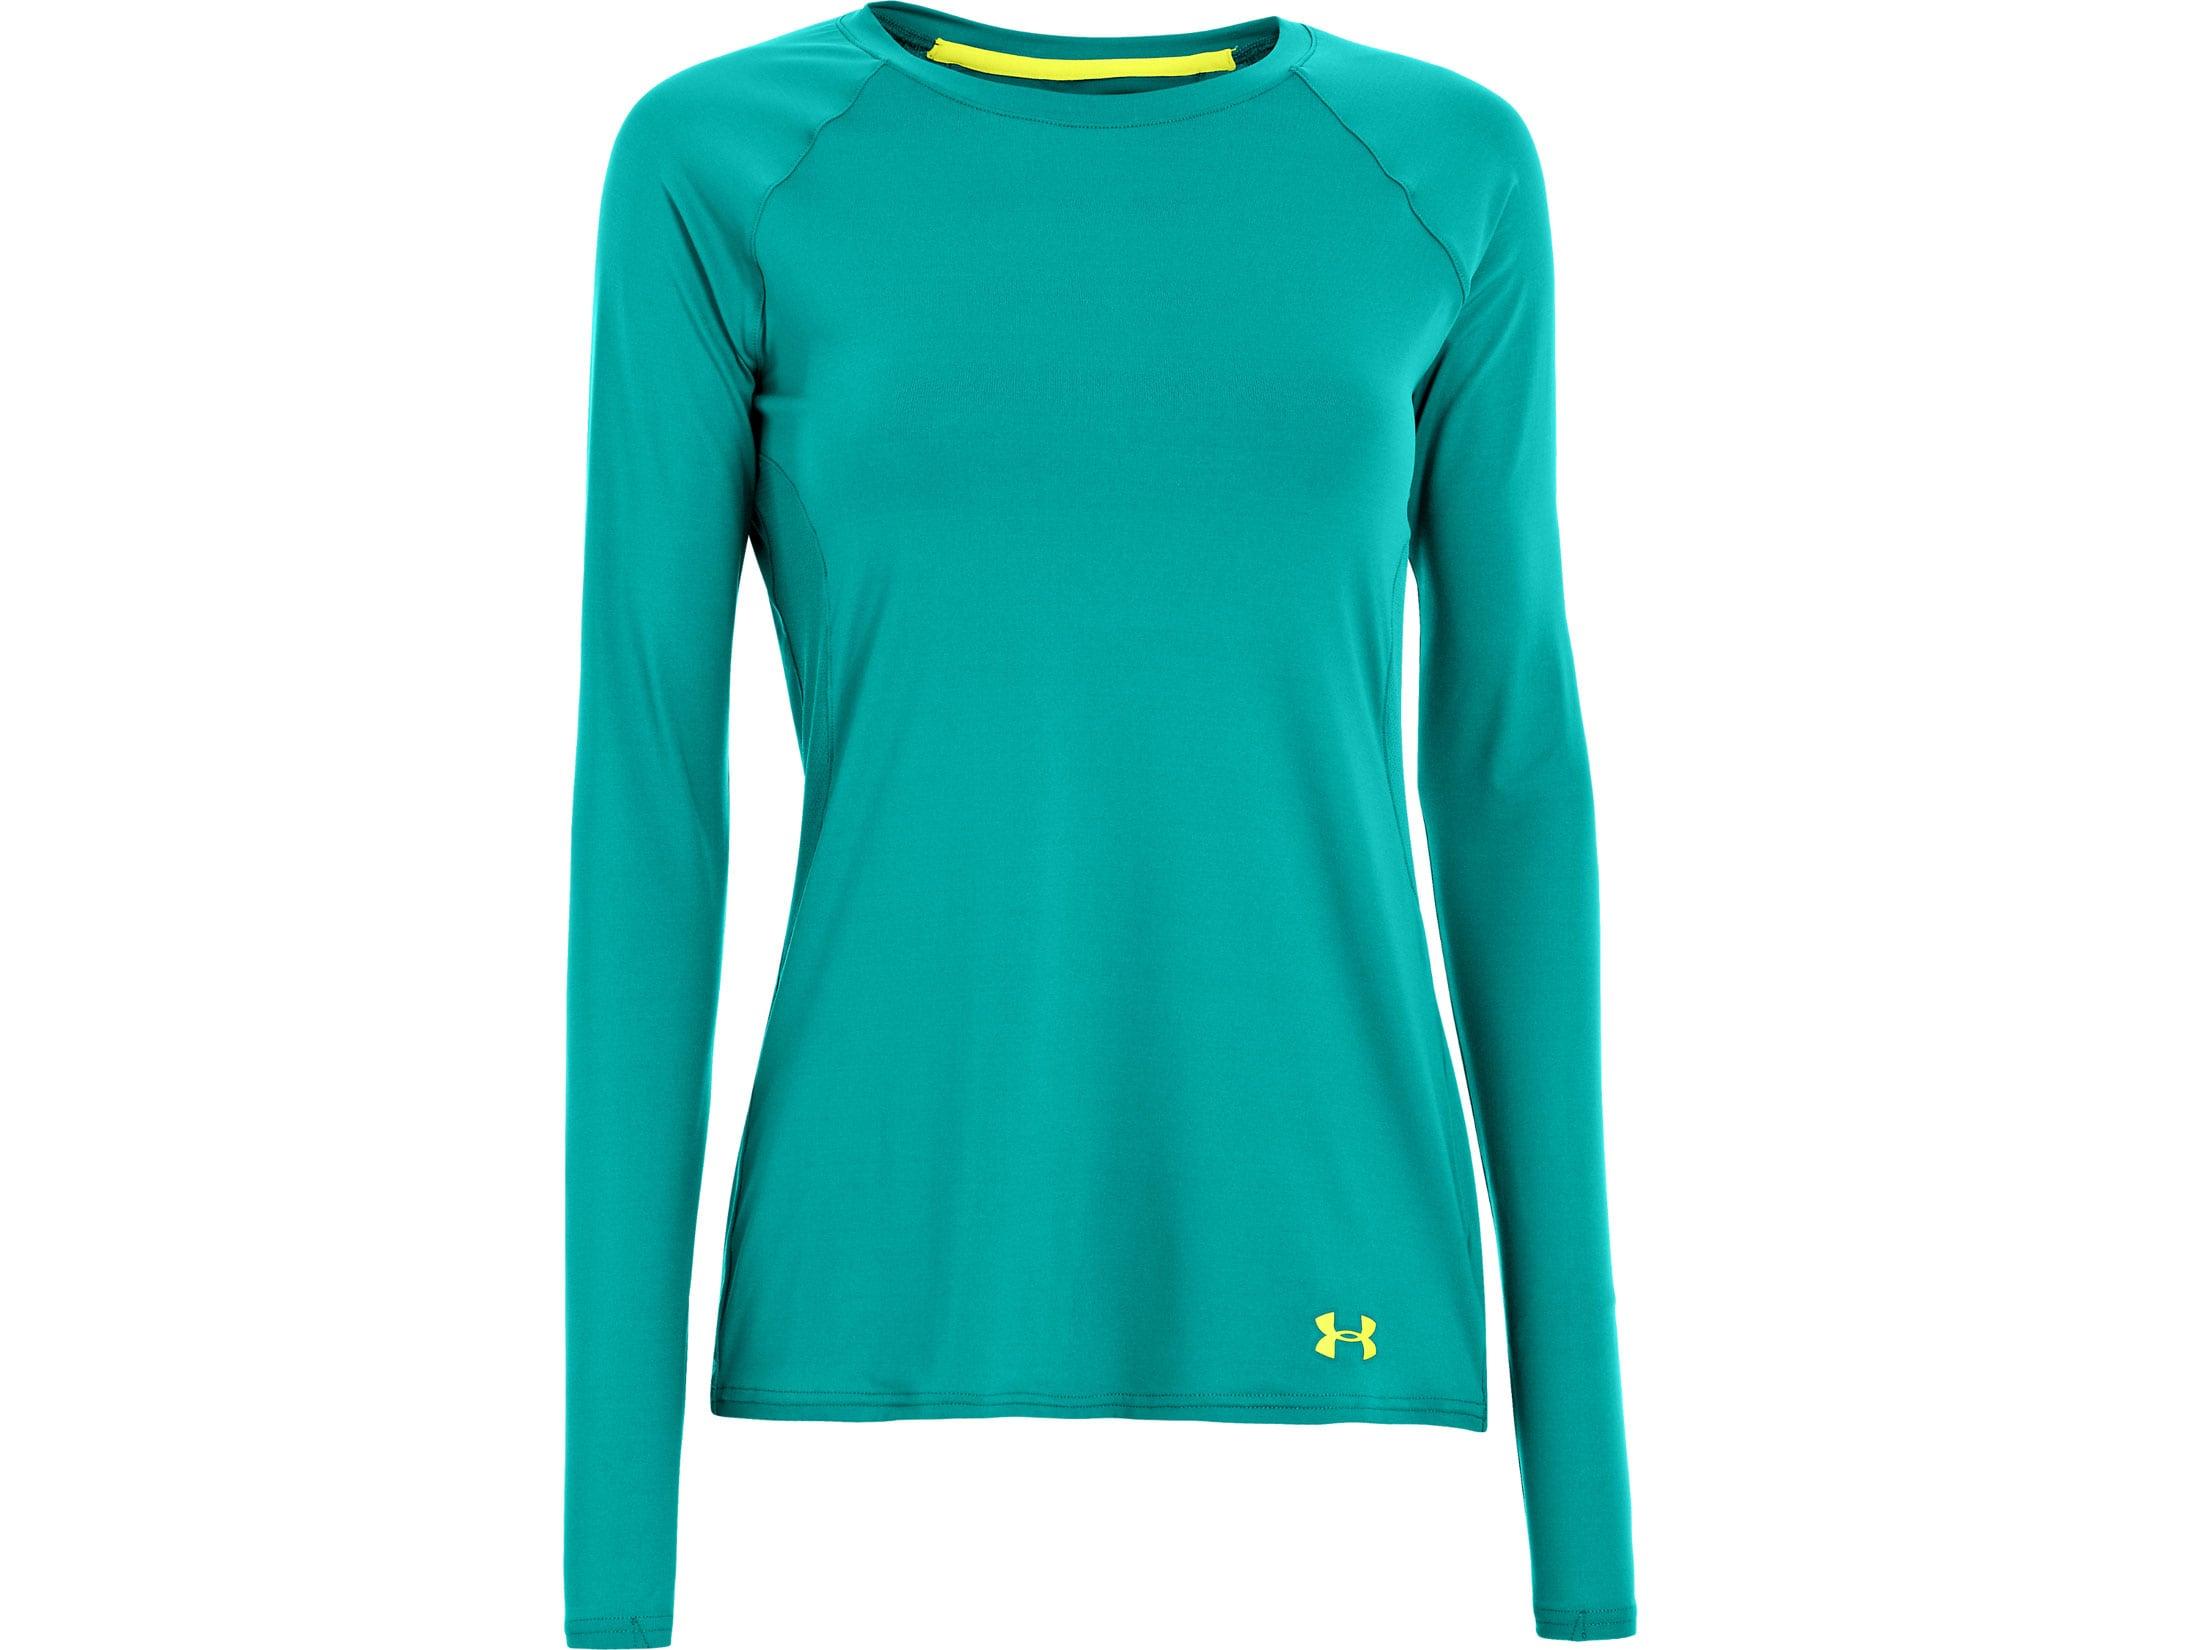 499e19e0db Under Armour Women's UA ISO Chill Long Sleeve Crew Shirt Polyester